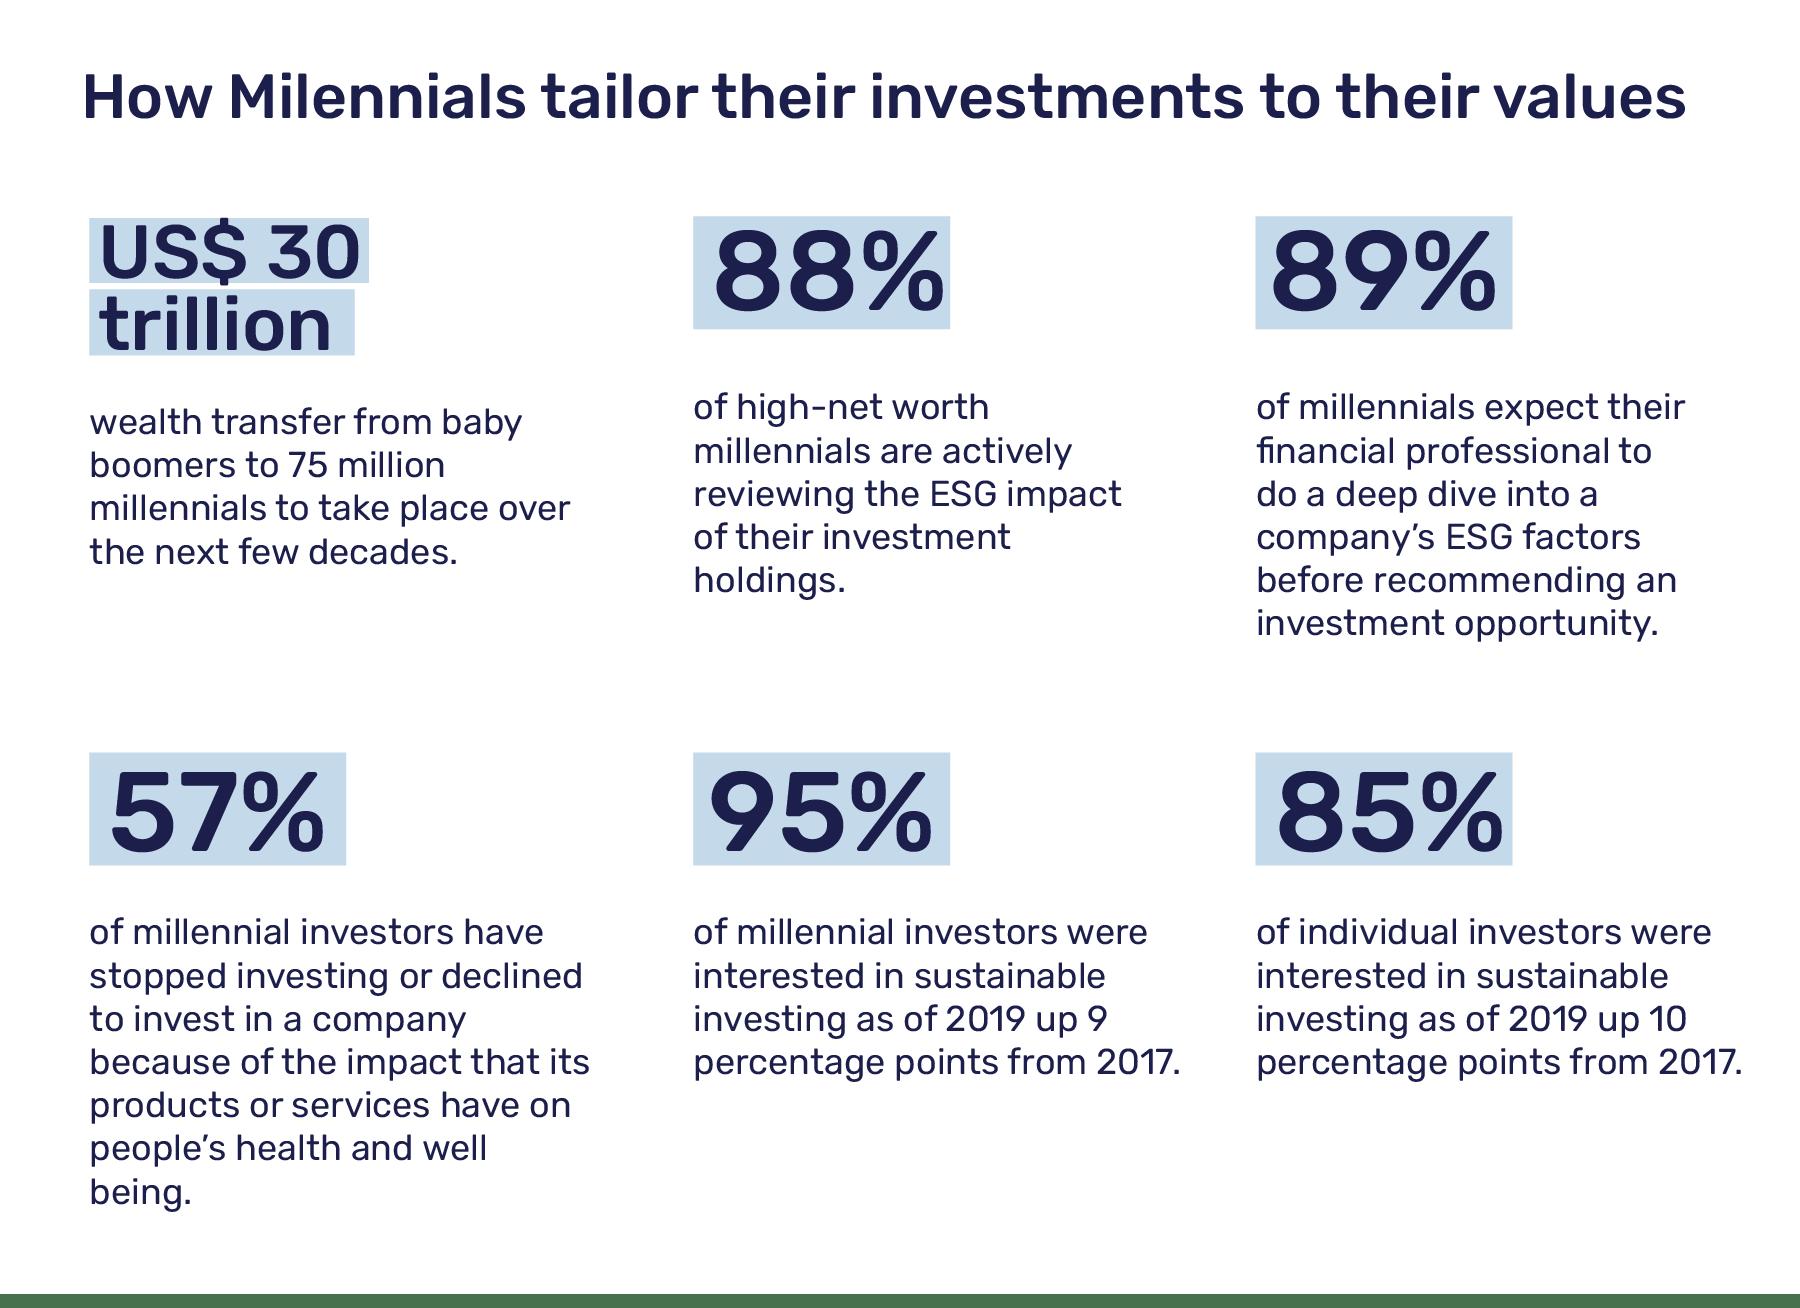 ESG, SRI and Impact Investing values